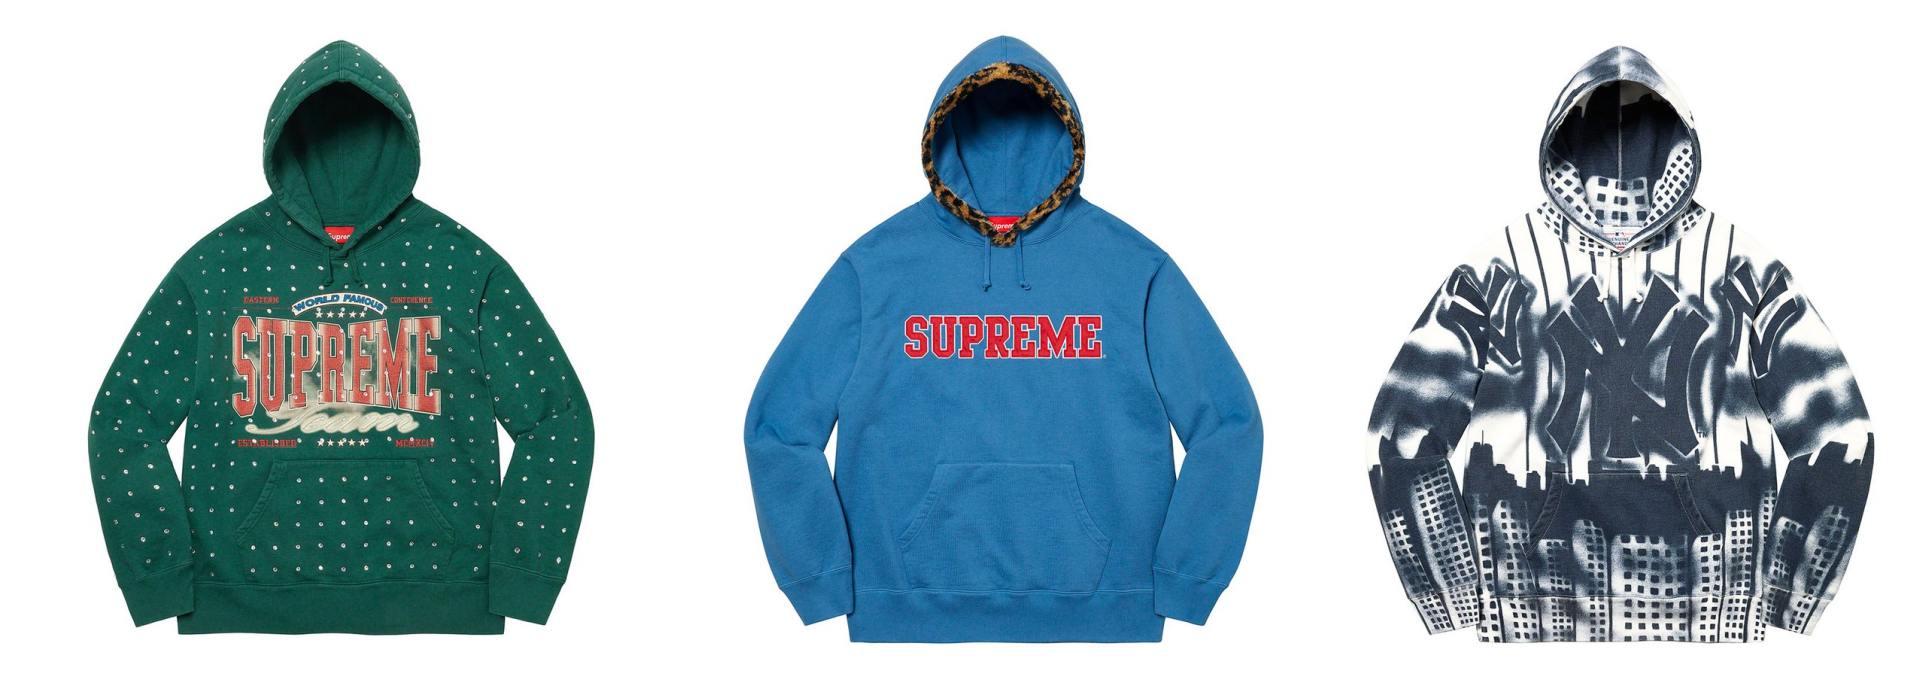 superme jacket - Supreme 2021秋冬系列正式发布,是一如往常的复古风!